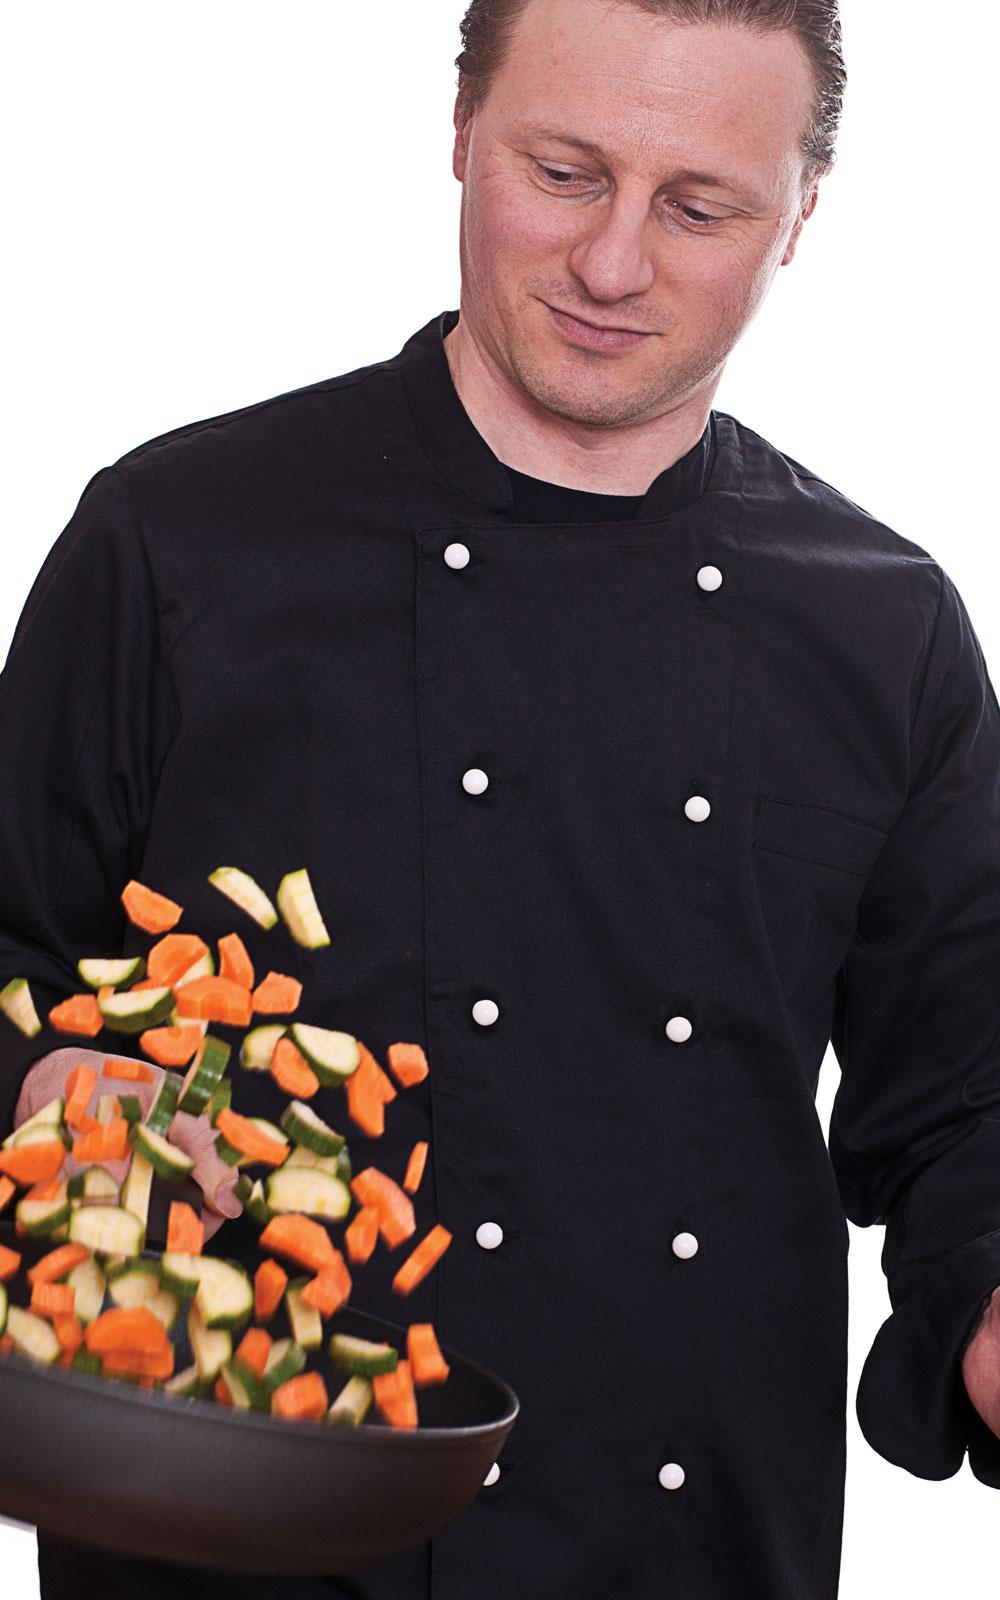 Executive-Chef-Jacket-2